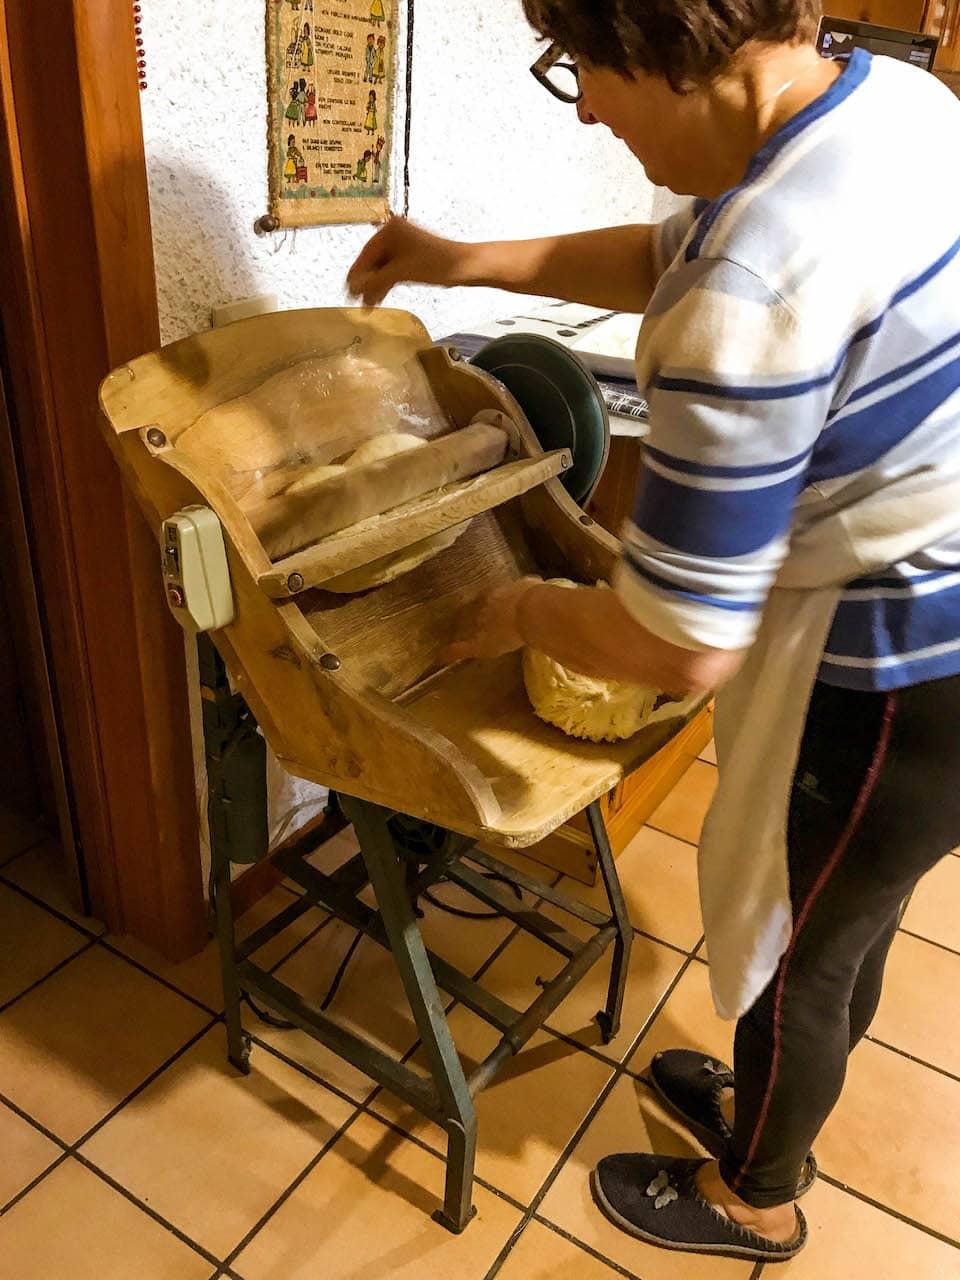 The Kneading Machines